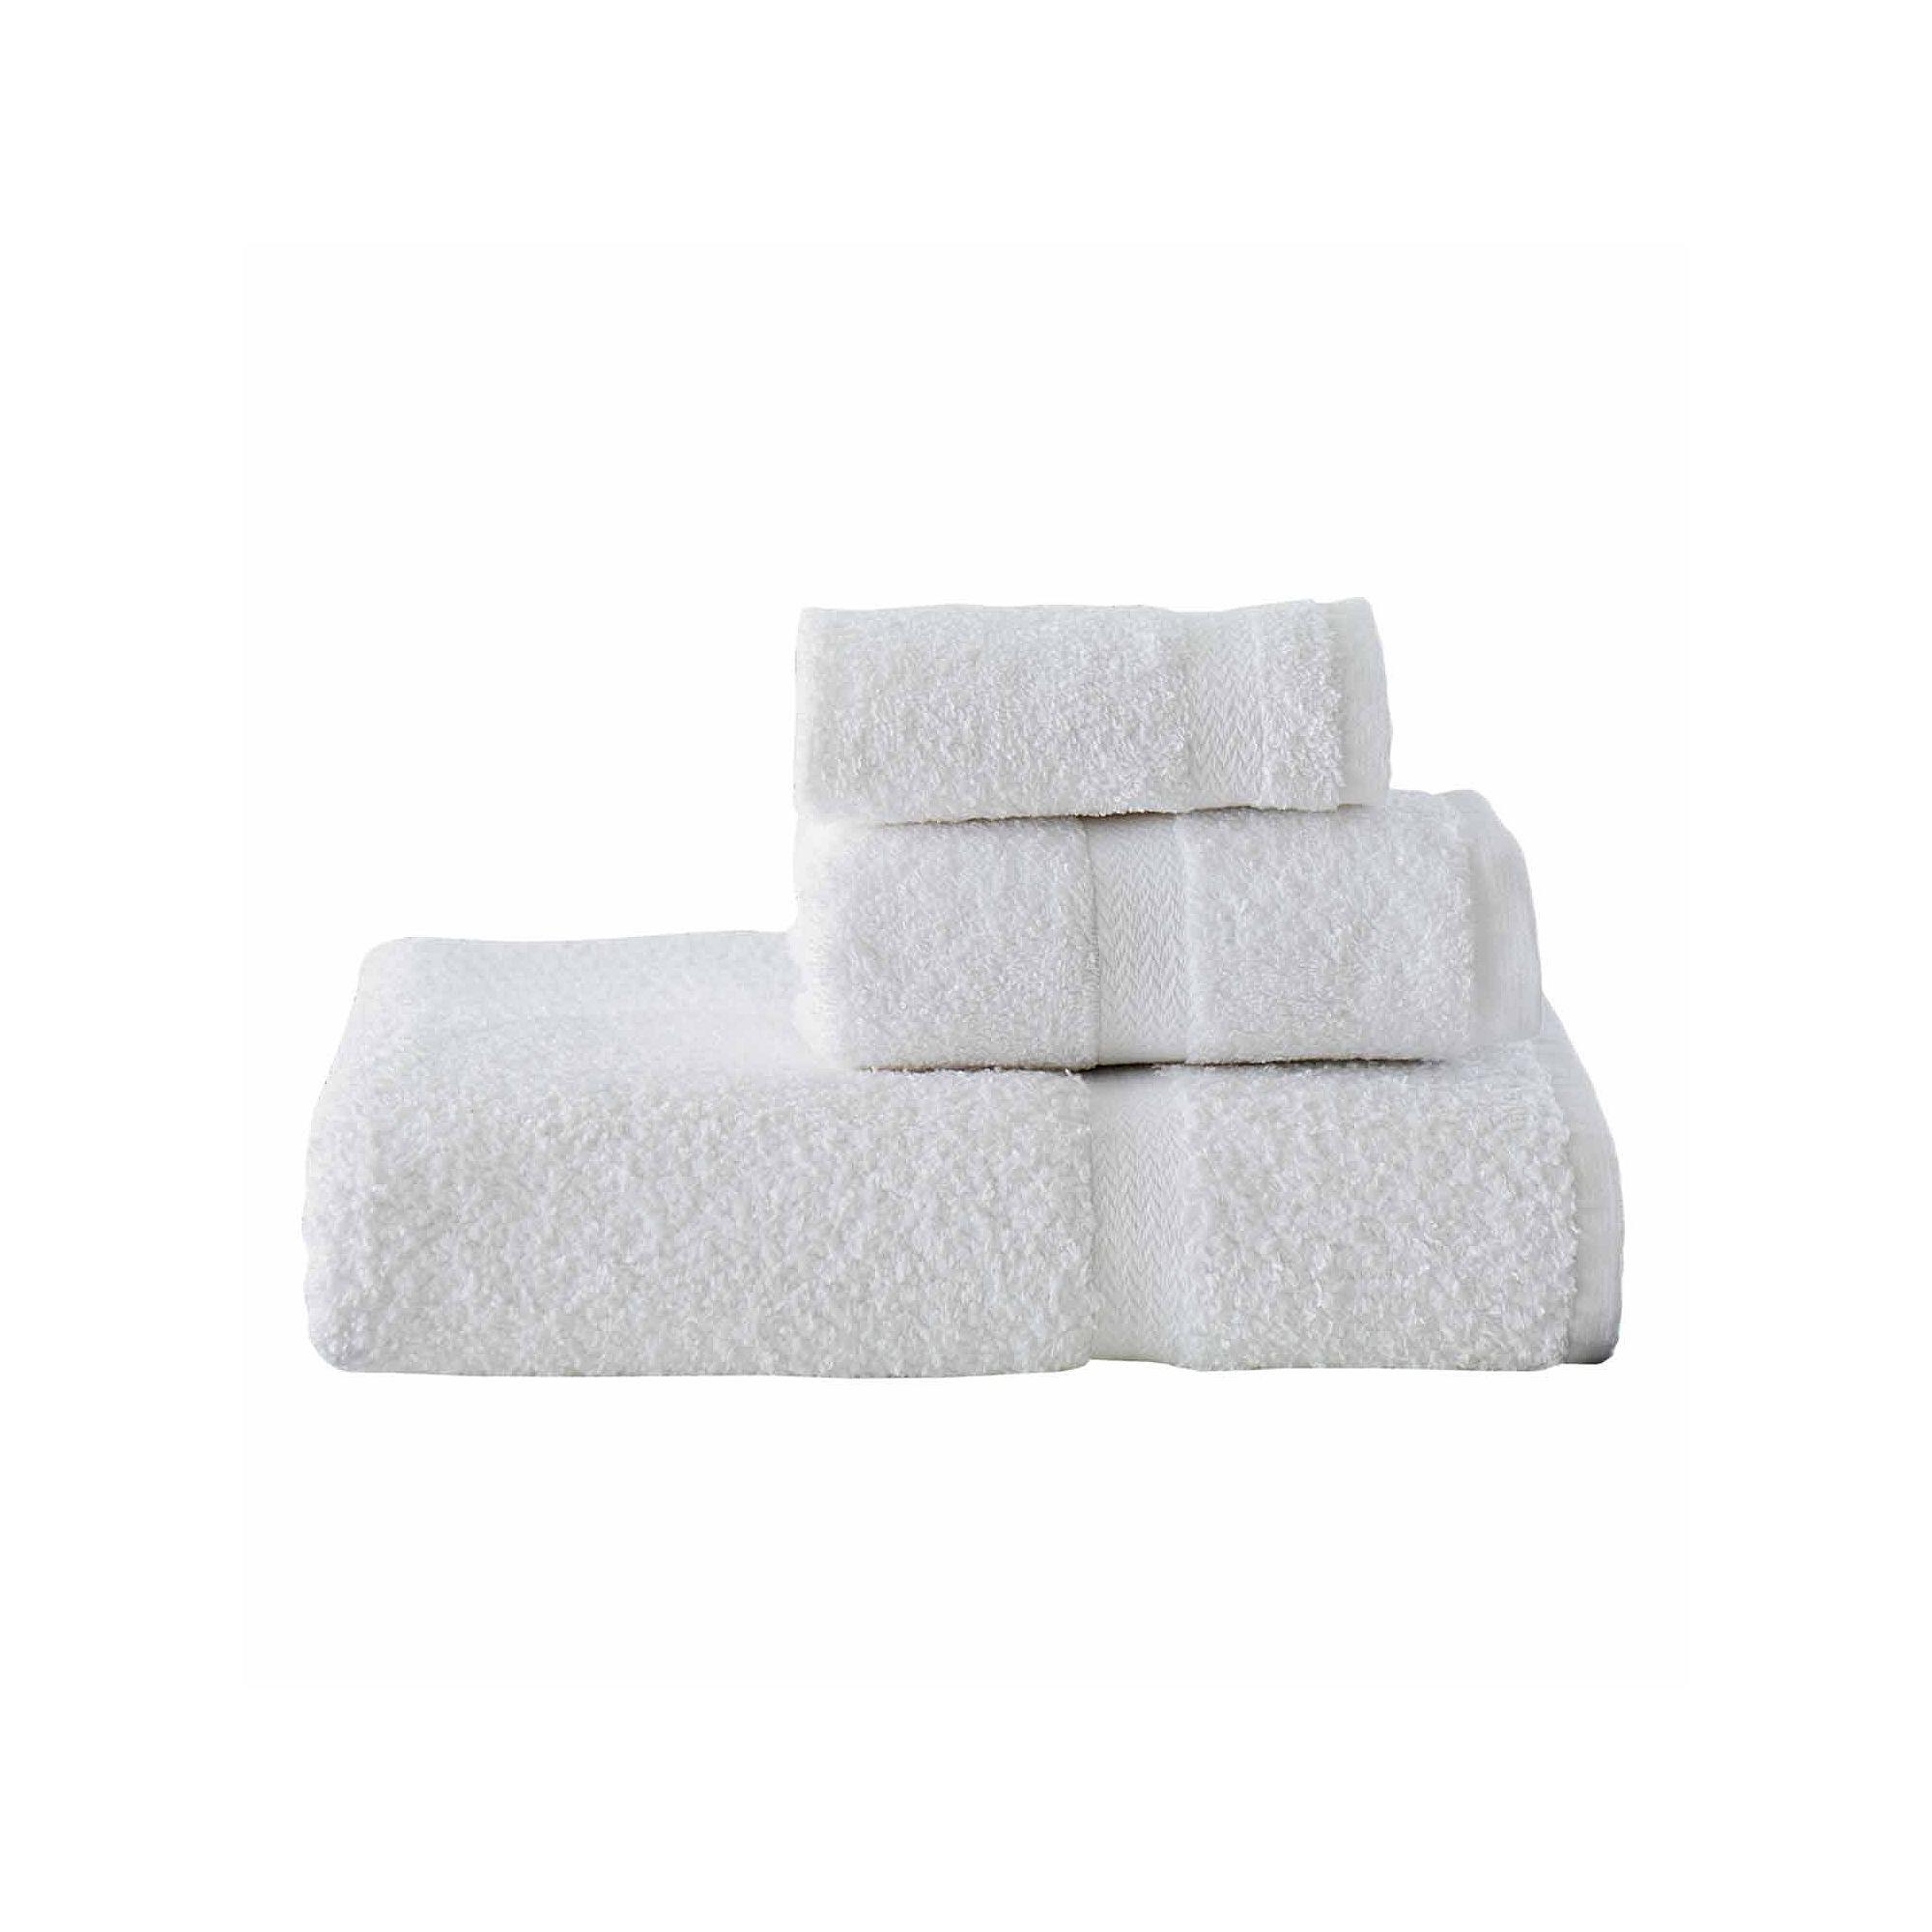 Welington 120-pc 16x30 Hand Towel Set